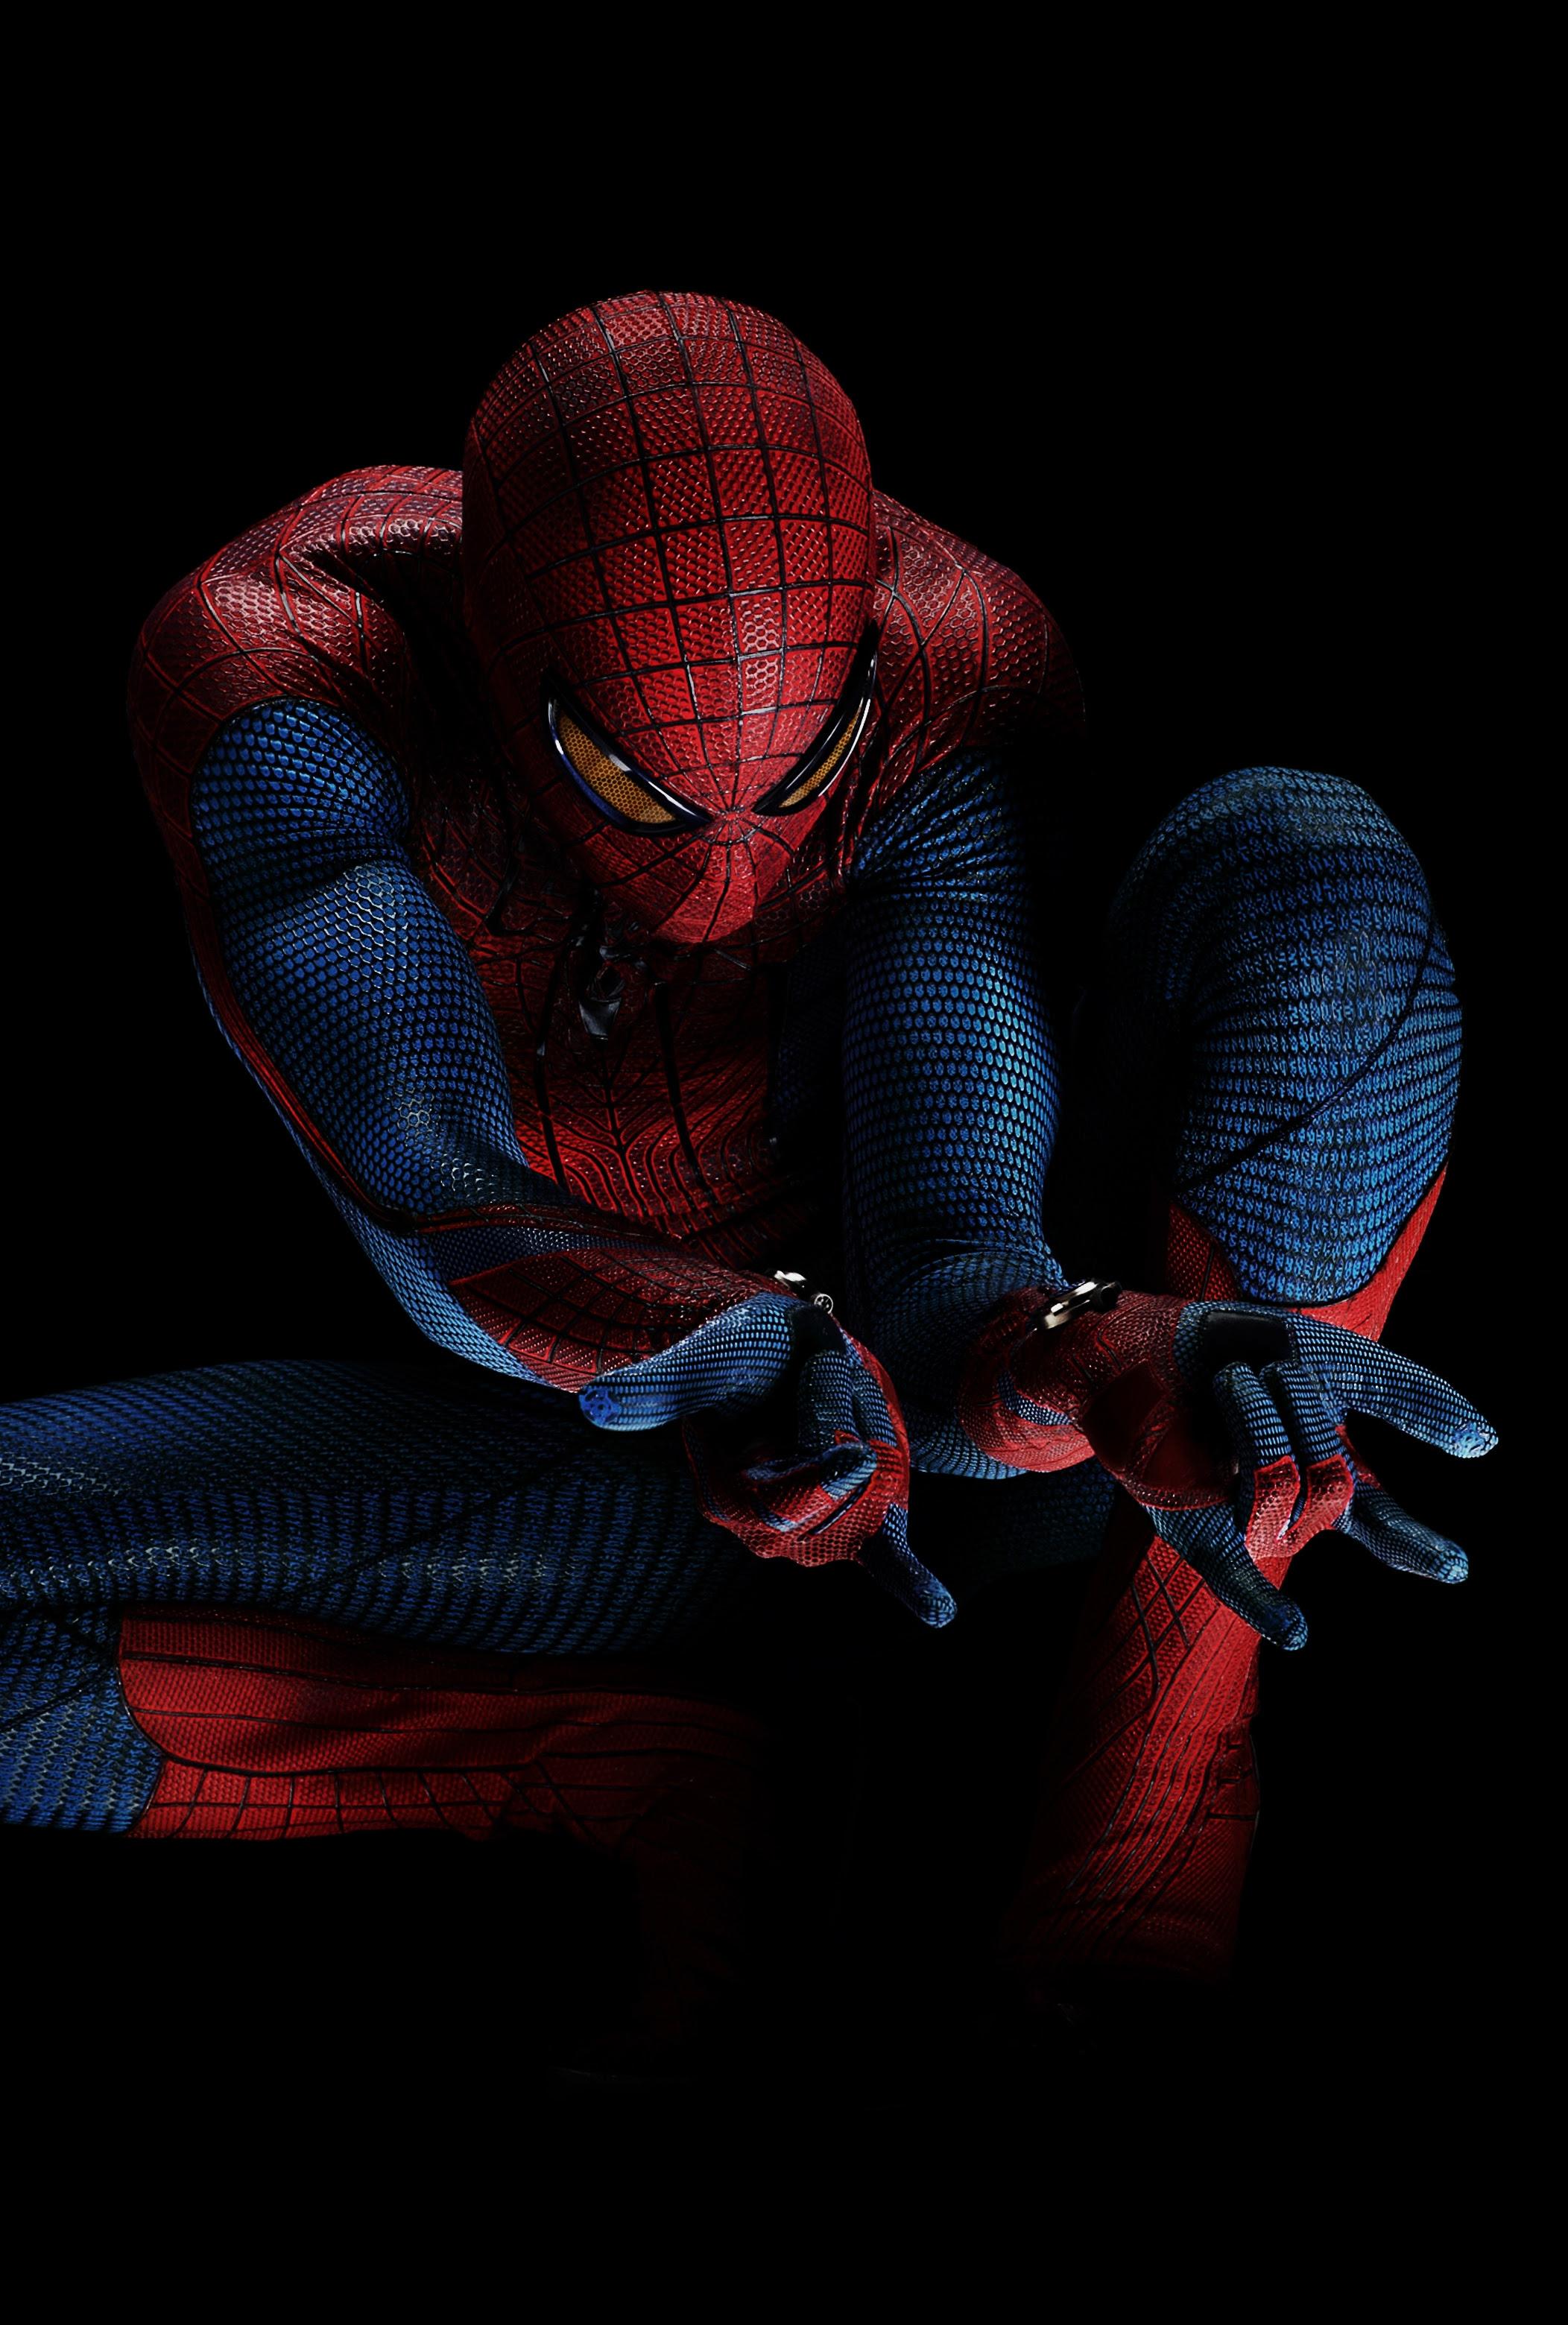 http://film-book.com/wp-content/uploads/2011/02/andrew-garfield-the-amazing-spider-man-01.jpg